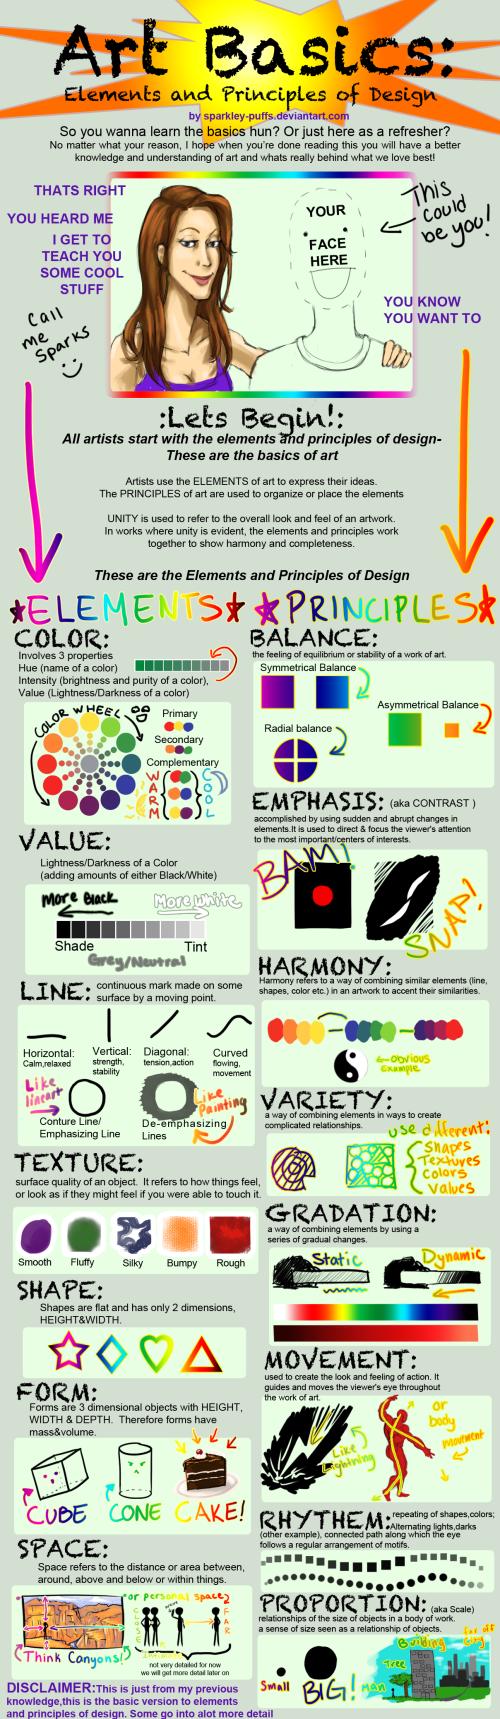 elements_principles_of_design_by_sparkley_puffs-d3j3dj8